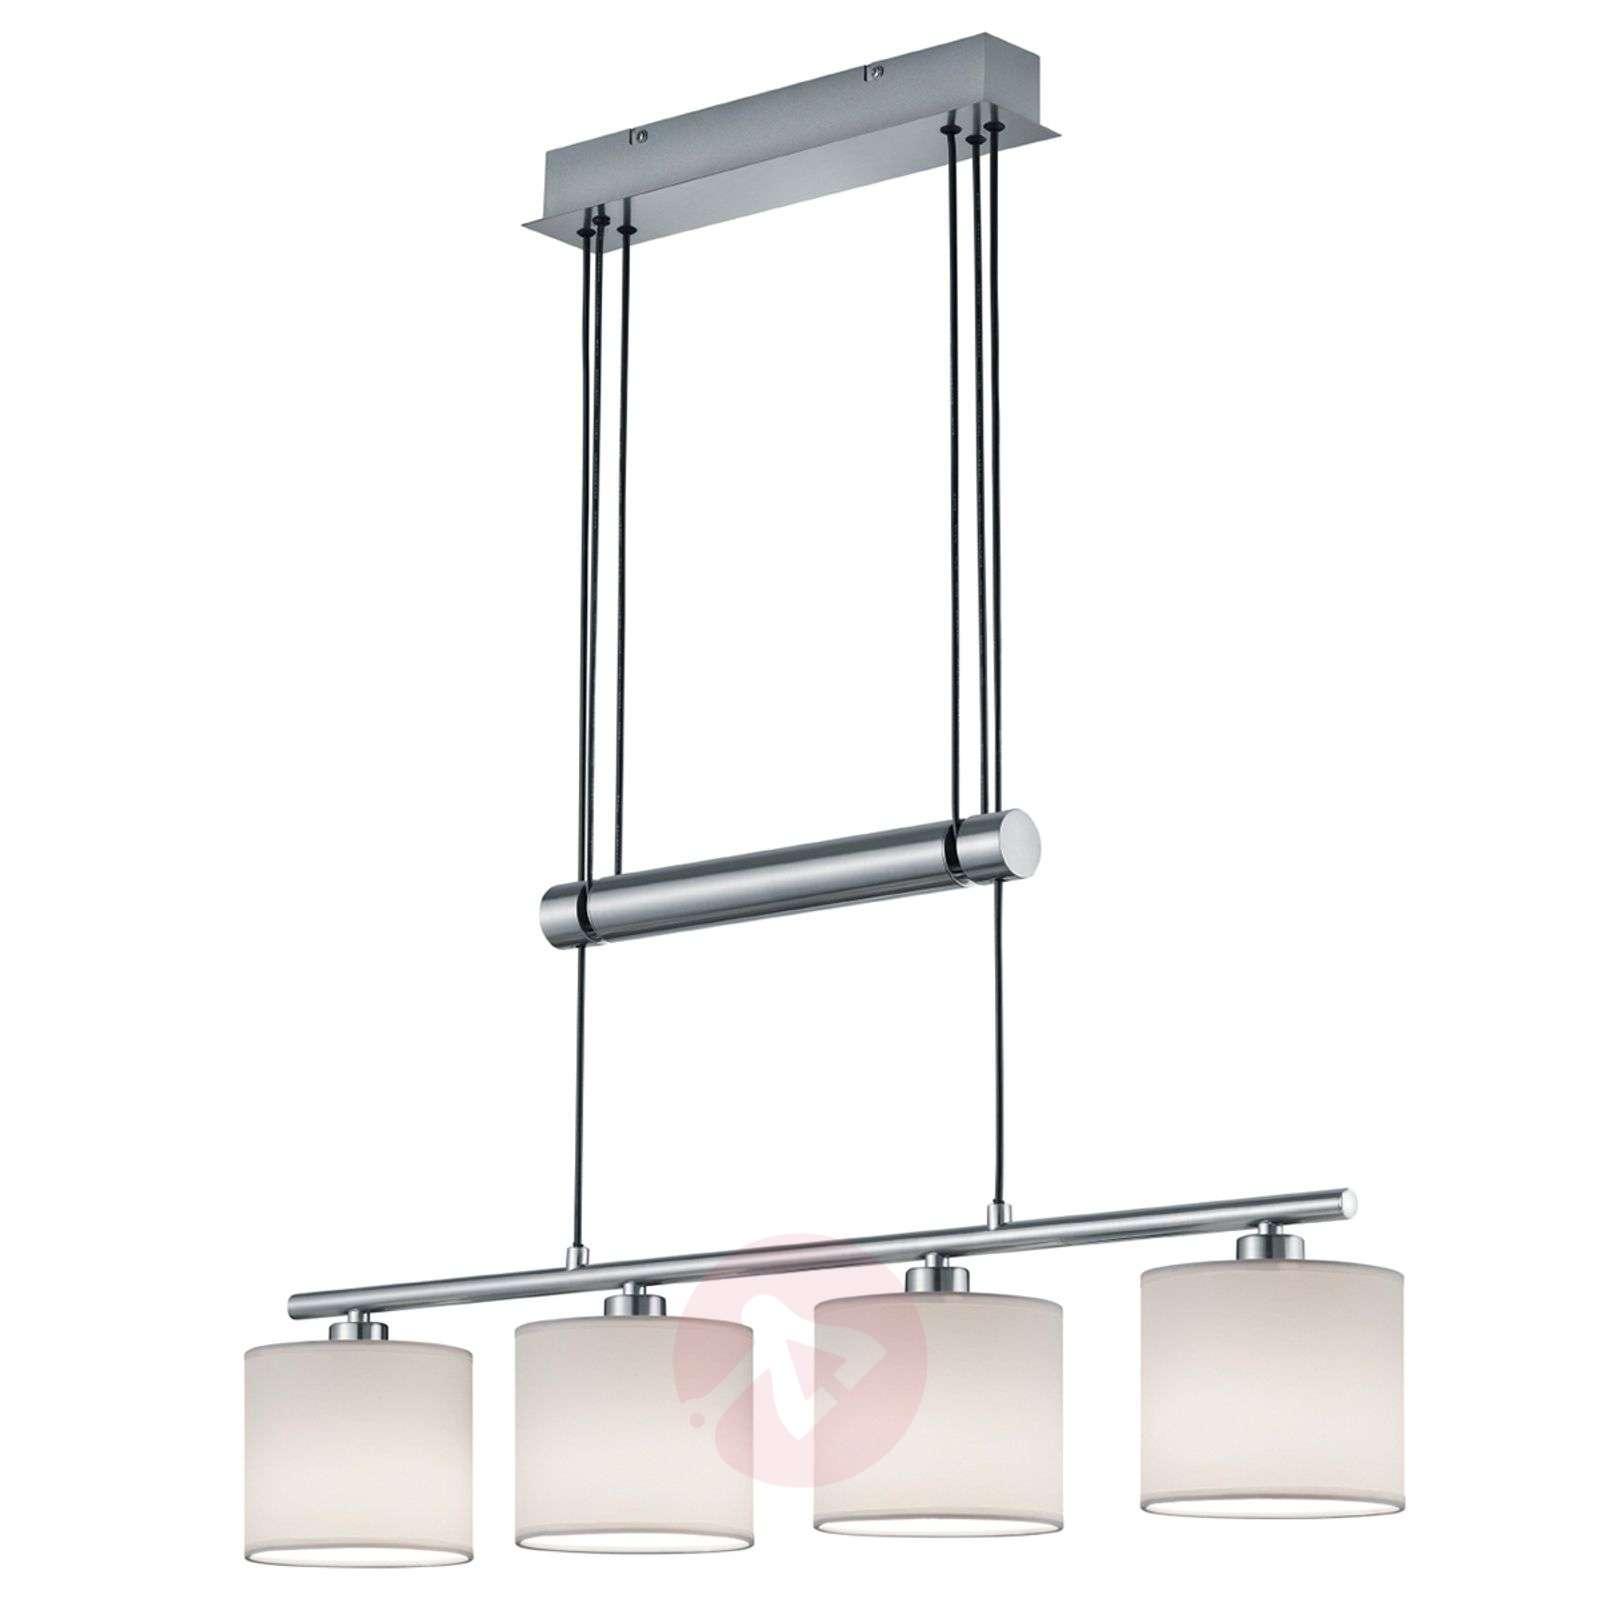 Four-bulb pendant lamp Garda, white-9005268-01